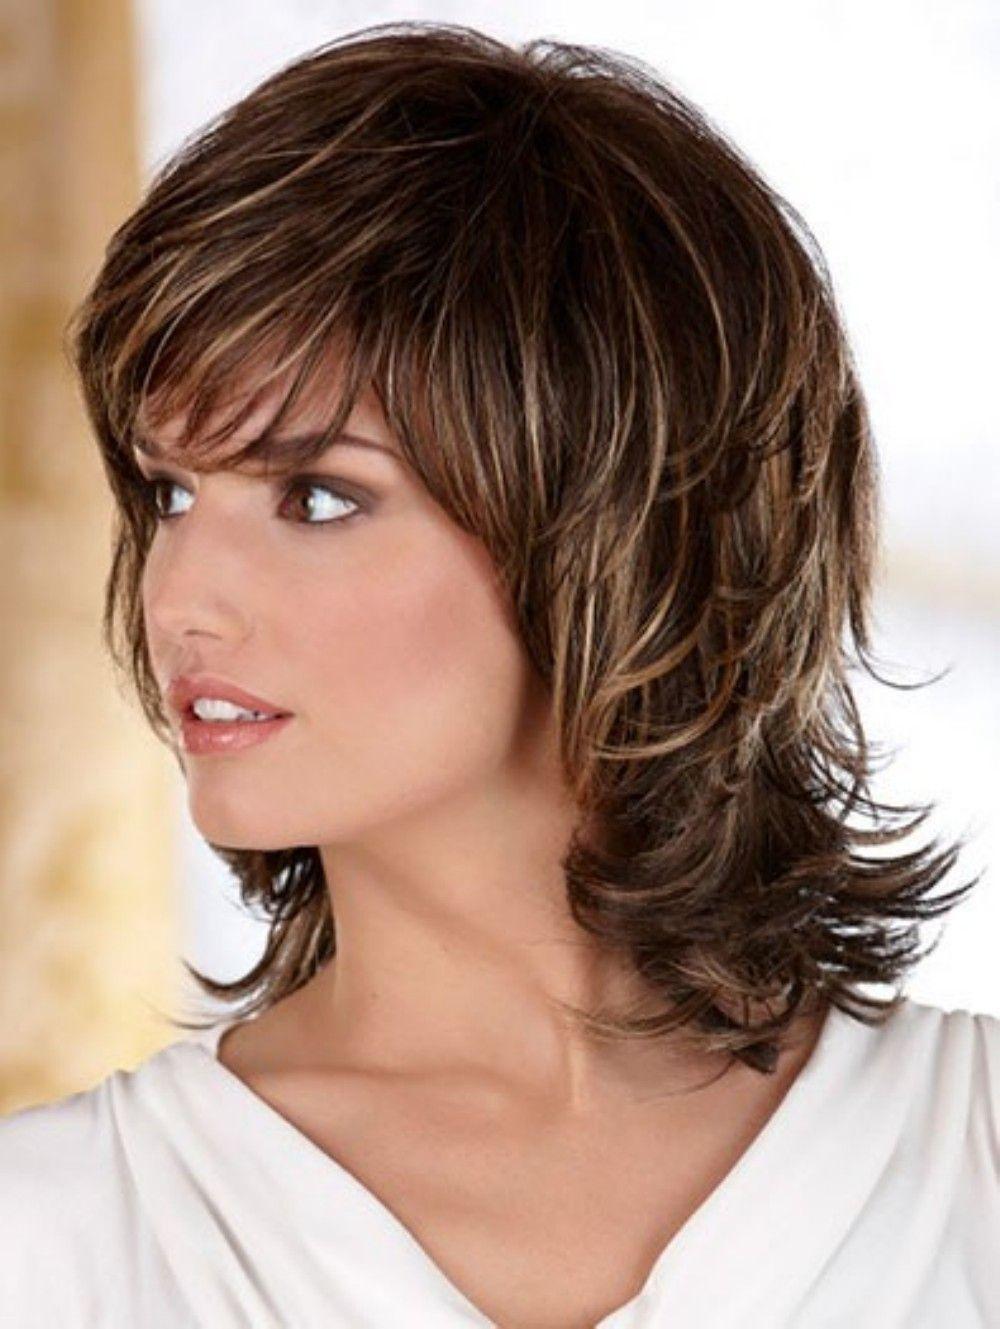 pin fashion magazine hairstyle